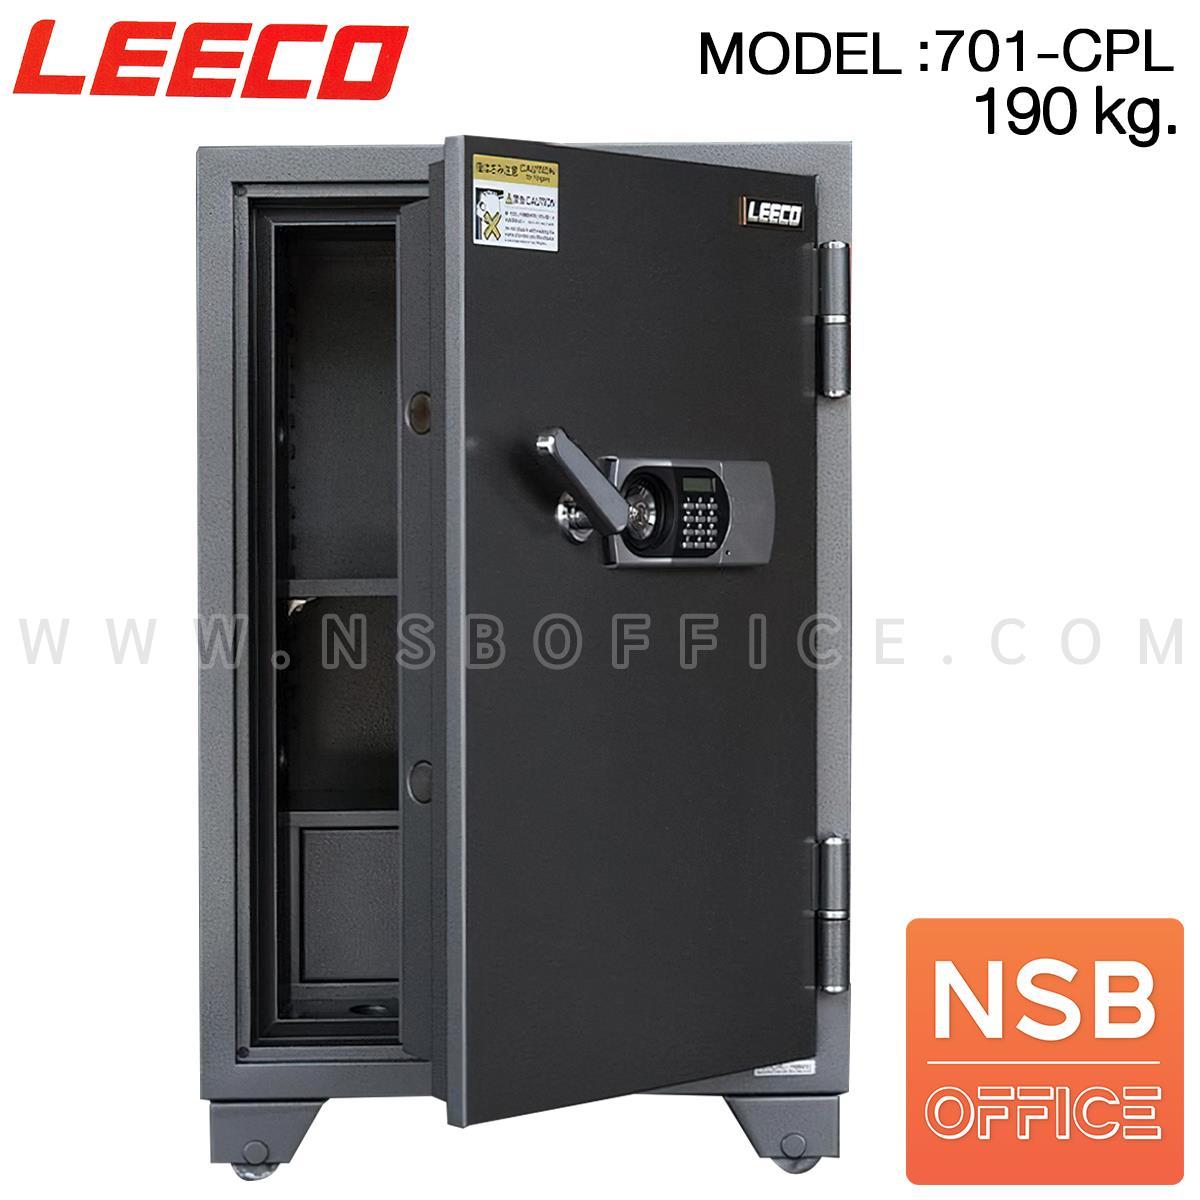 F02A063:ตู้เซฟดิจิตอล 190 กก. รุ่น 701-CPL  1 กุญแจ 1 รหัส